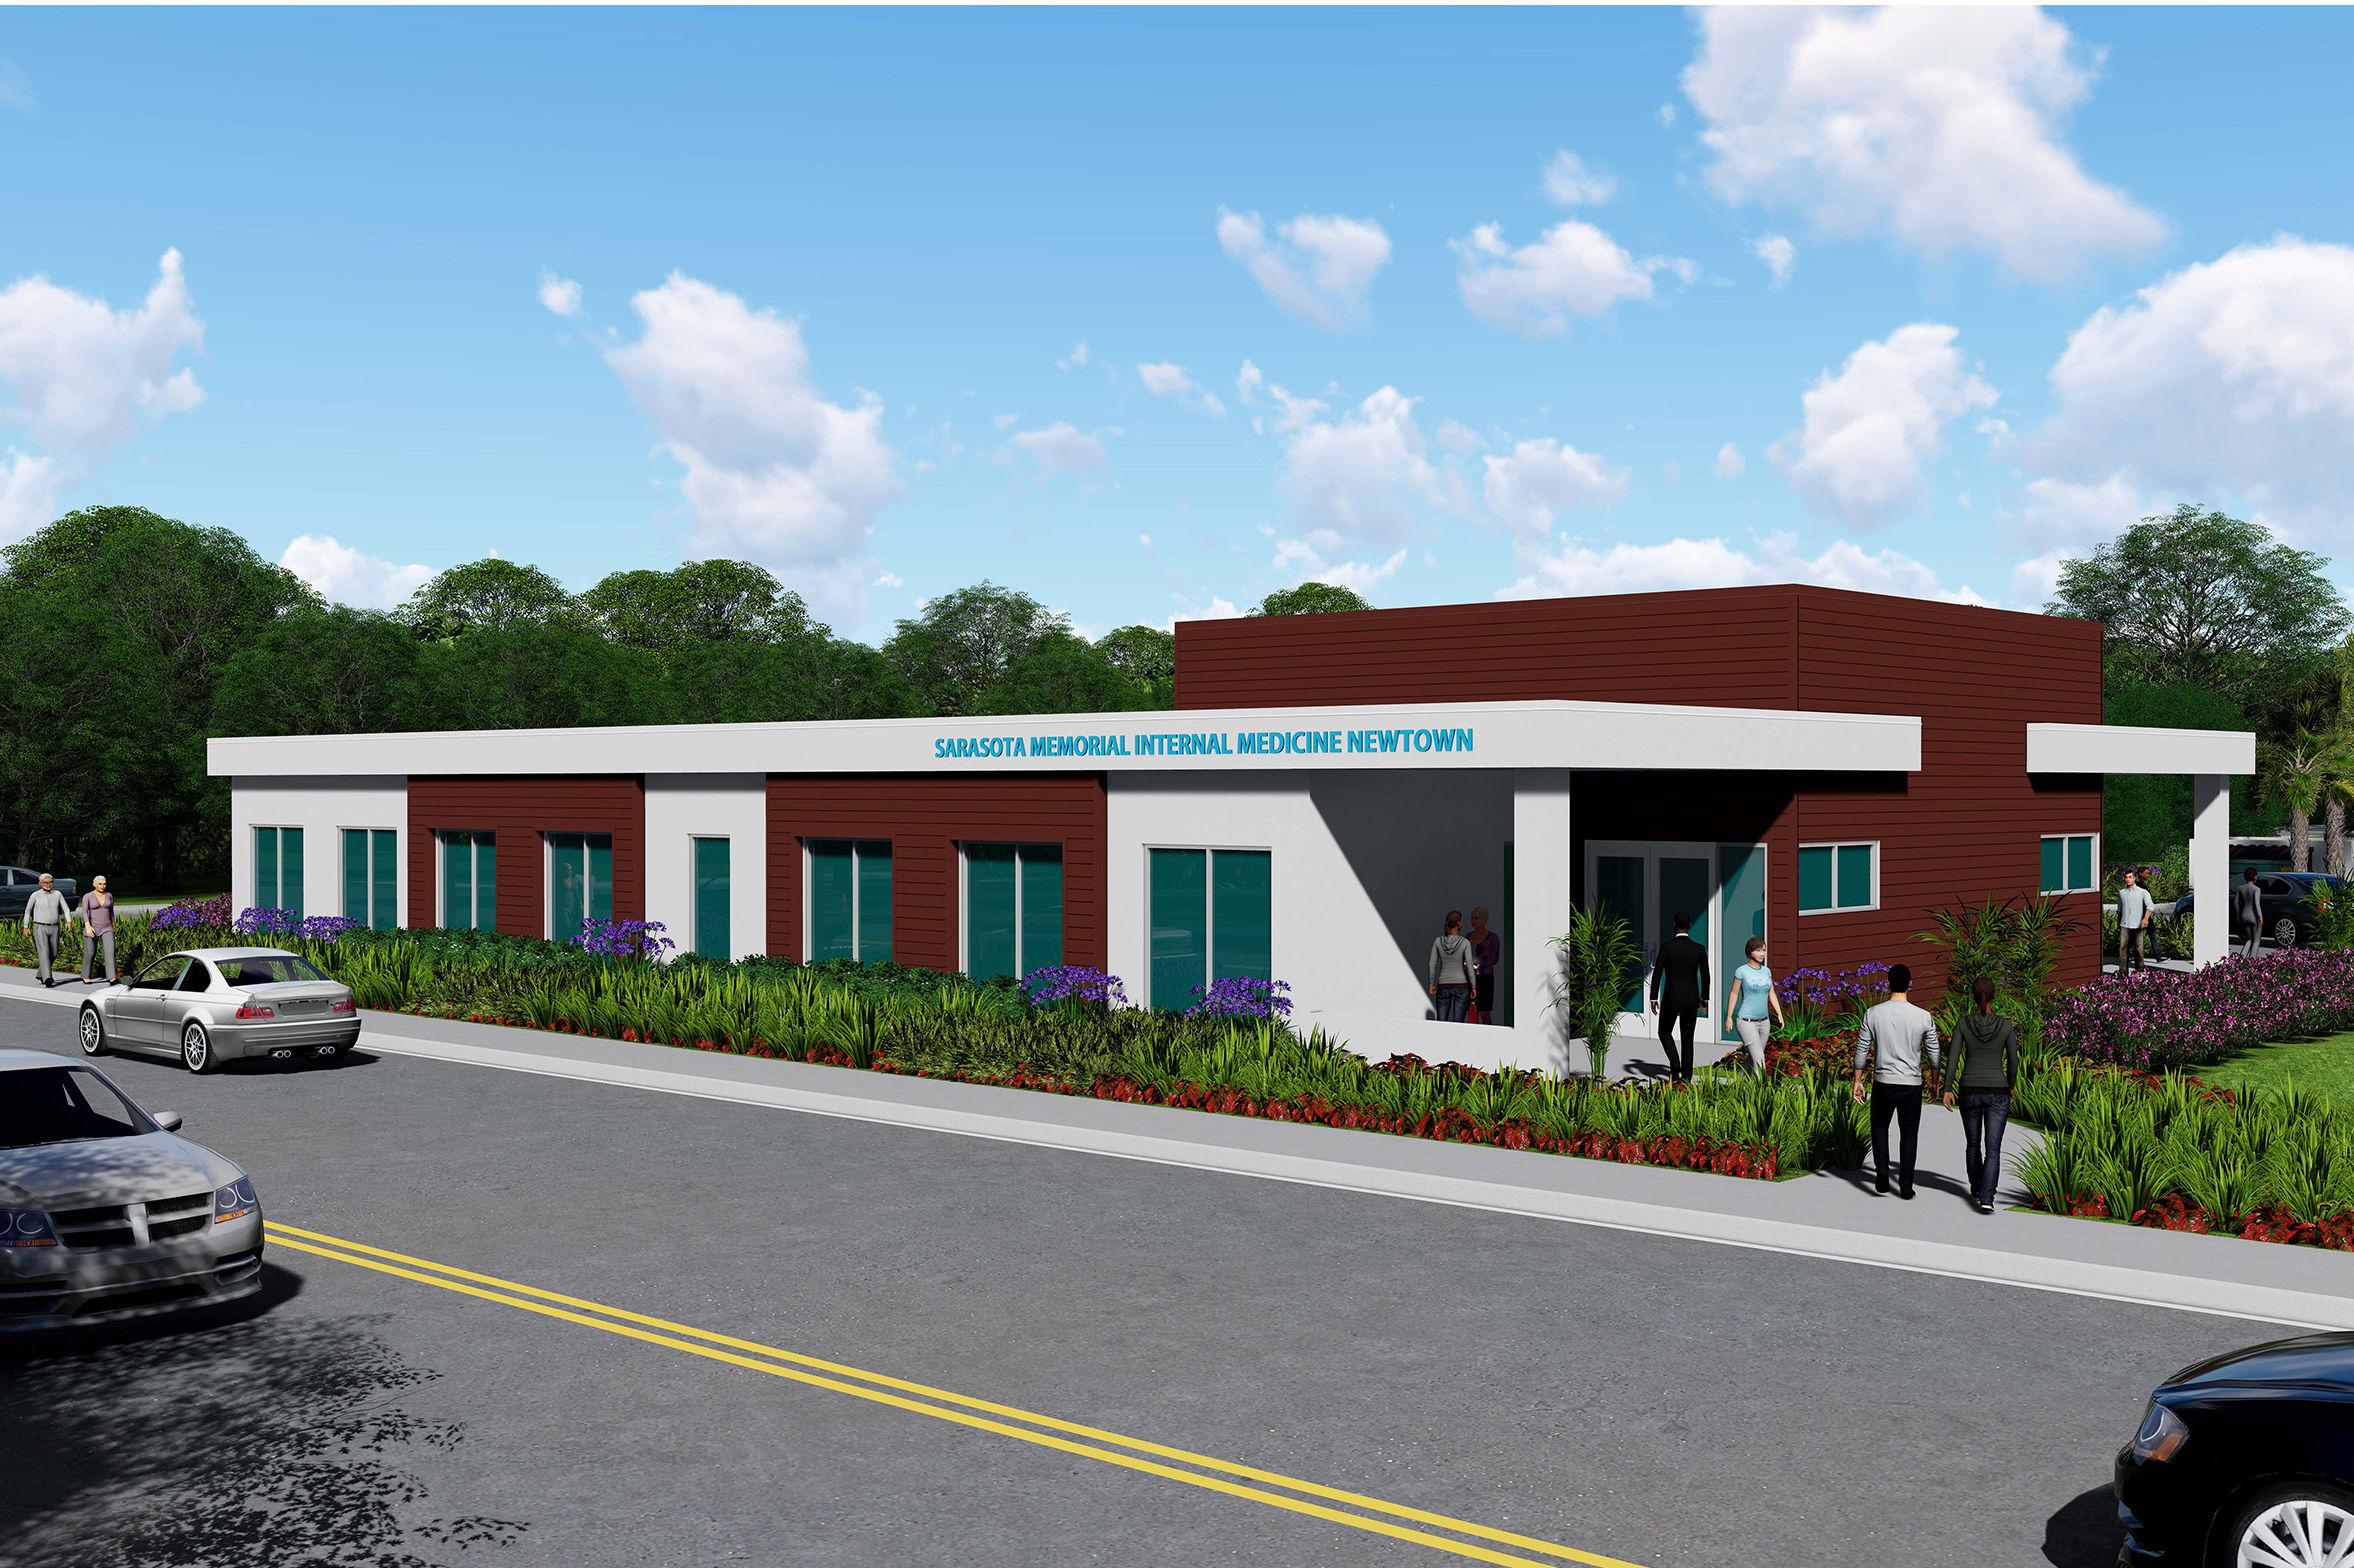 Sarasota memorial health care system levv1y